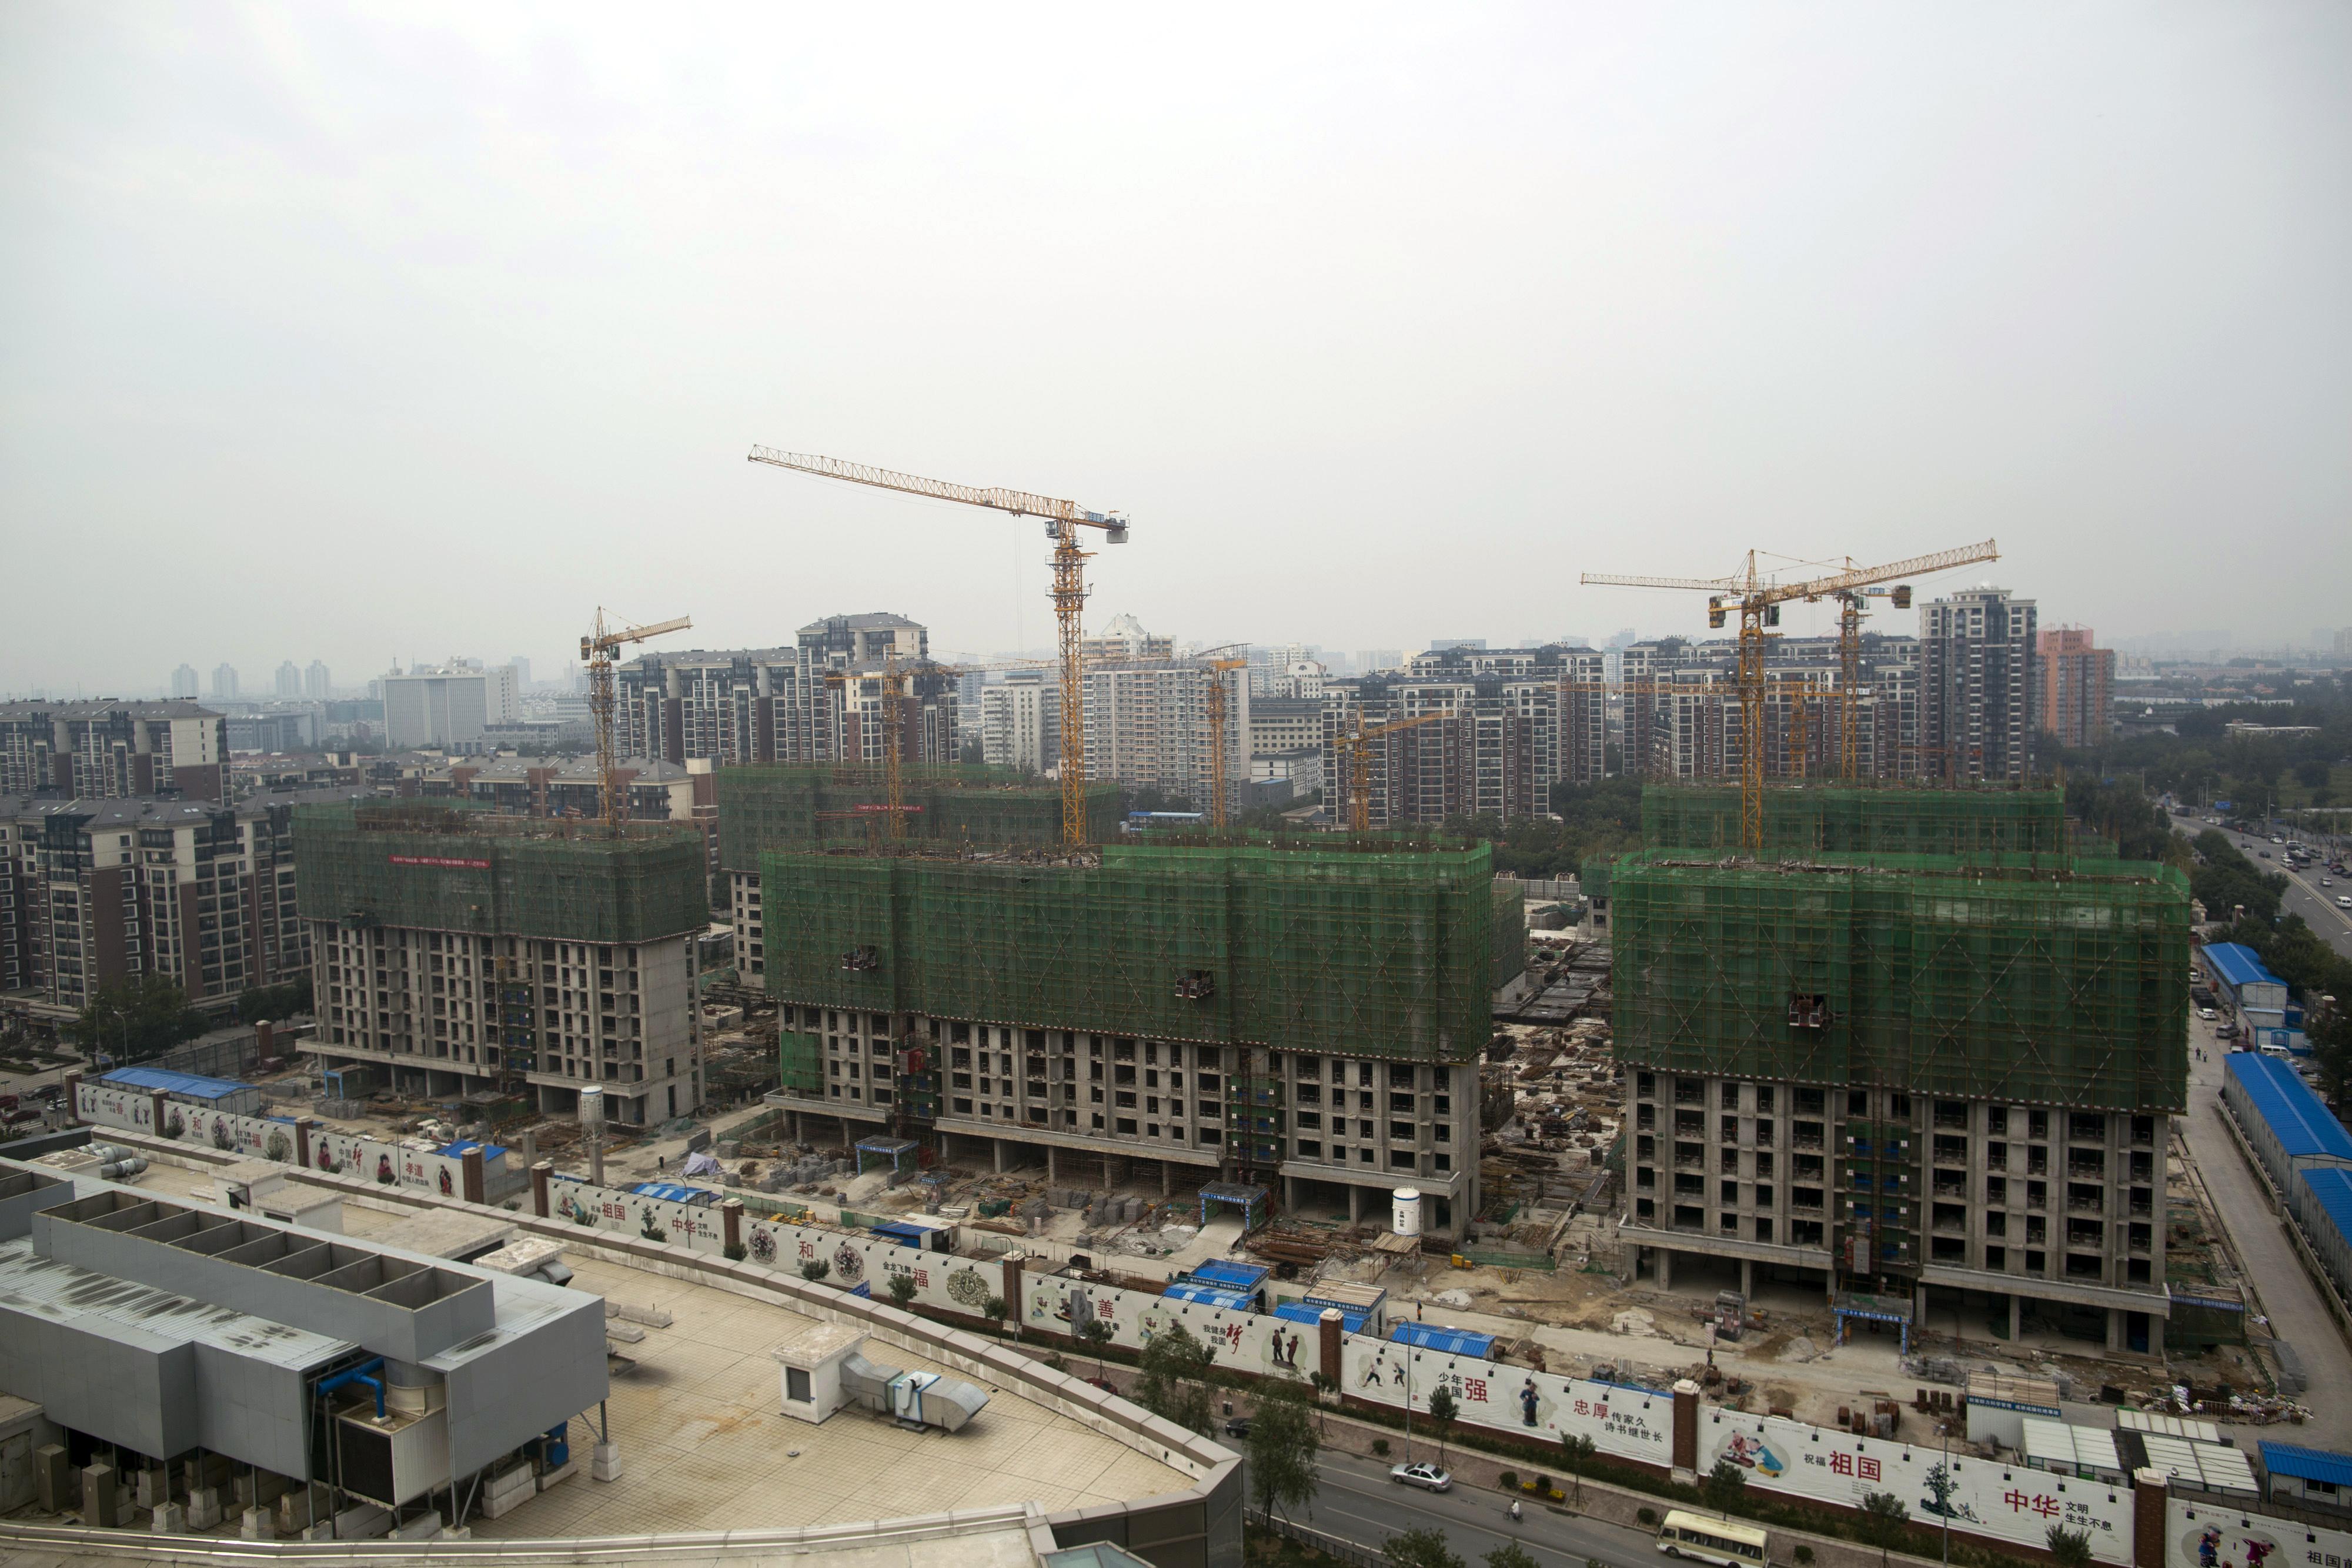 General Scenes Of The PBOC And Economy In Beijing